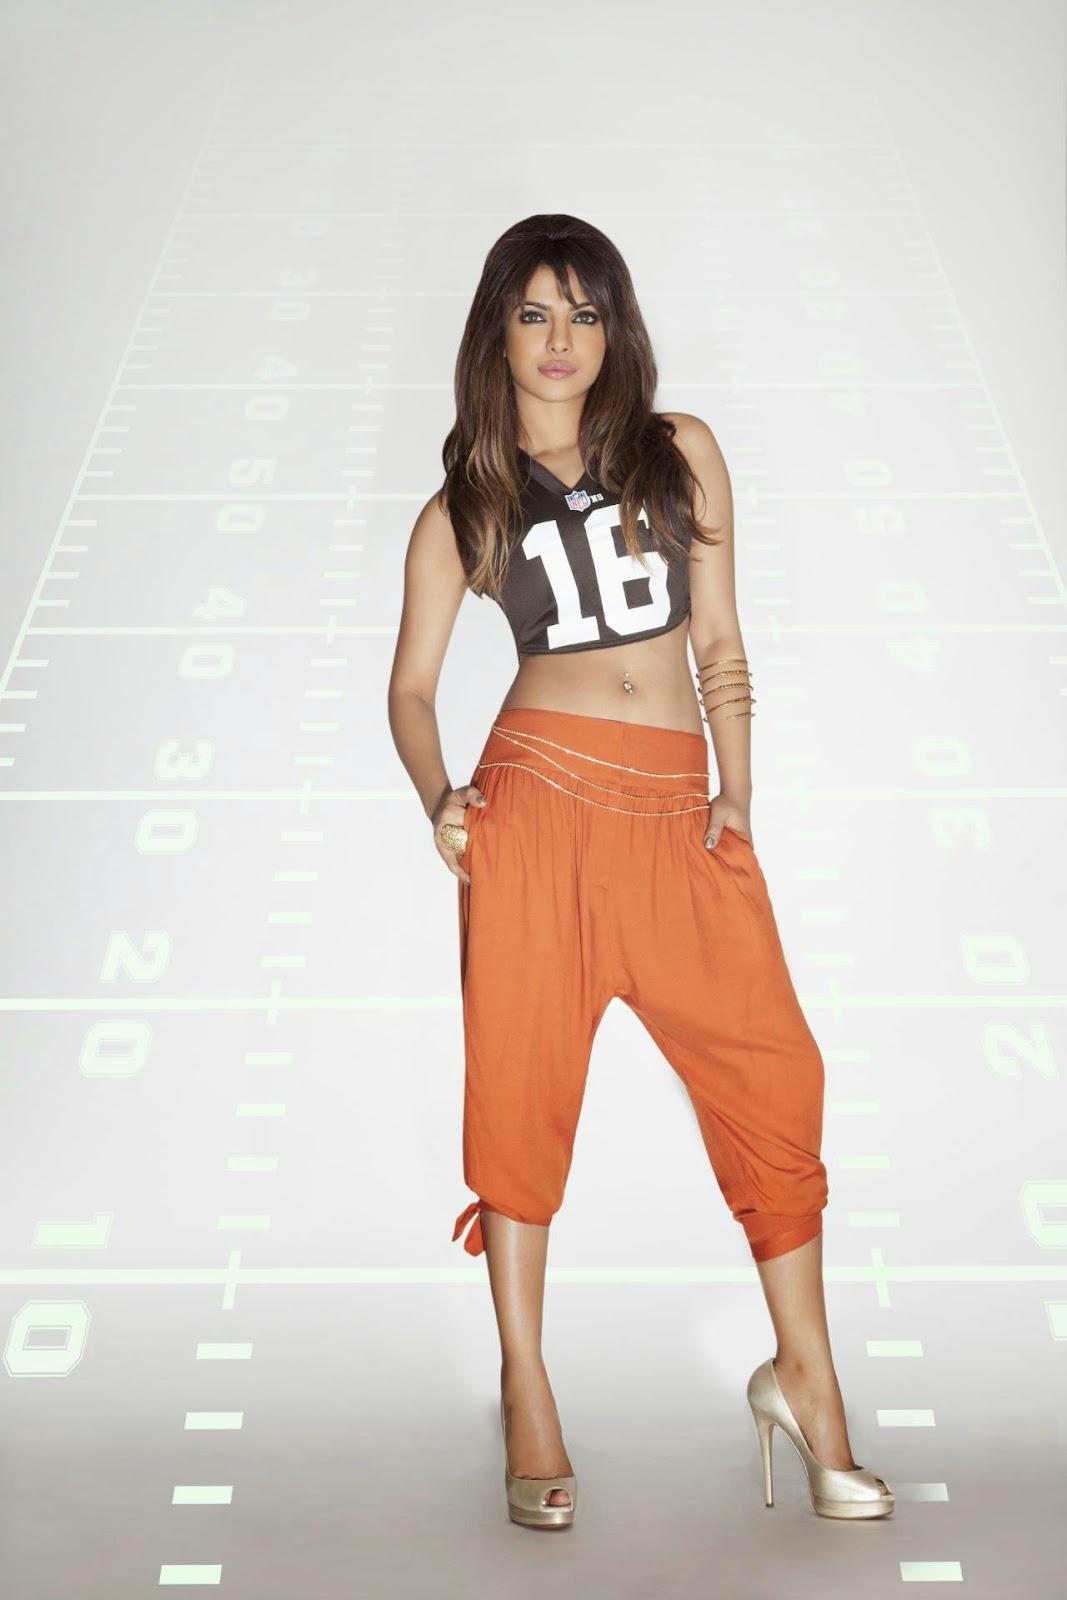 Priyanka Chopra's Sexy Legs in NFL Jersey & Jinny Pants